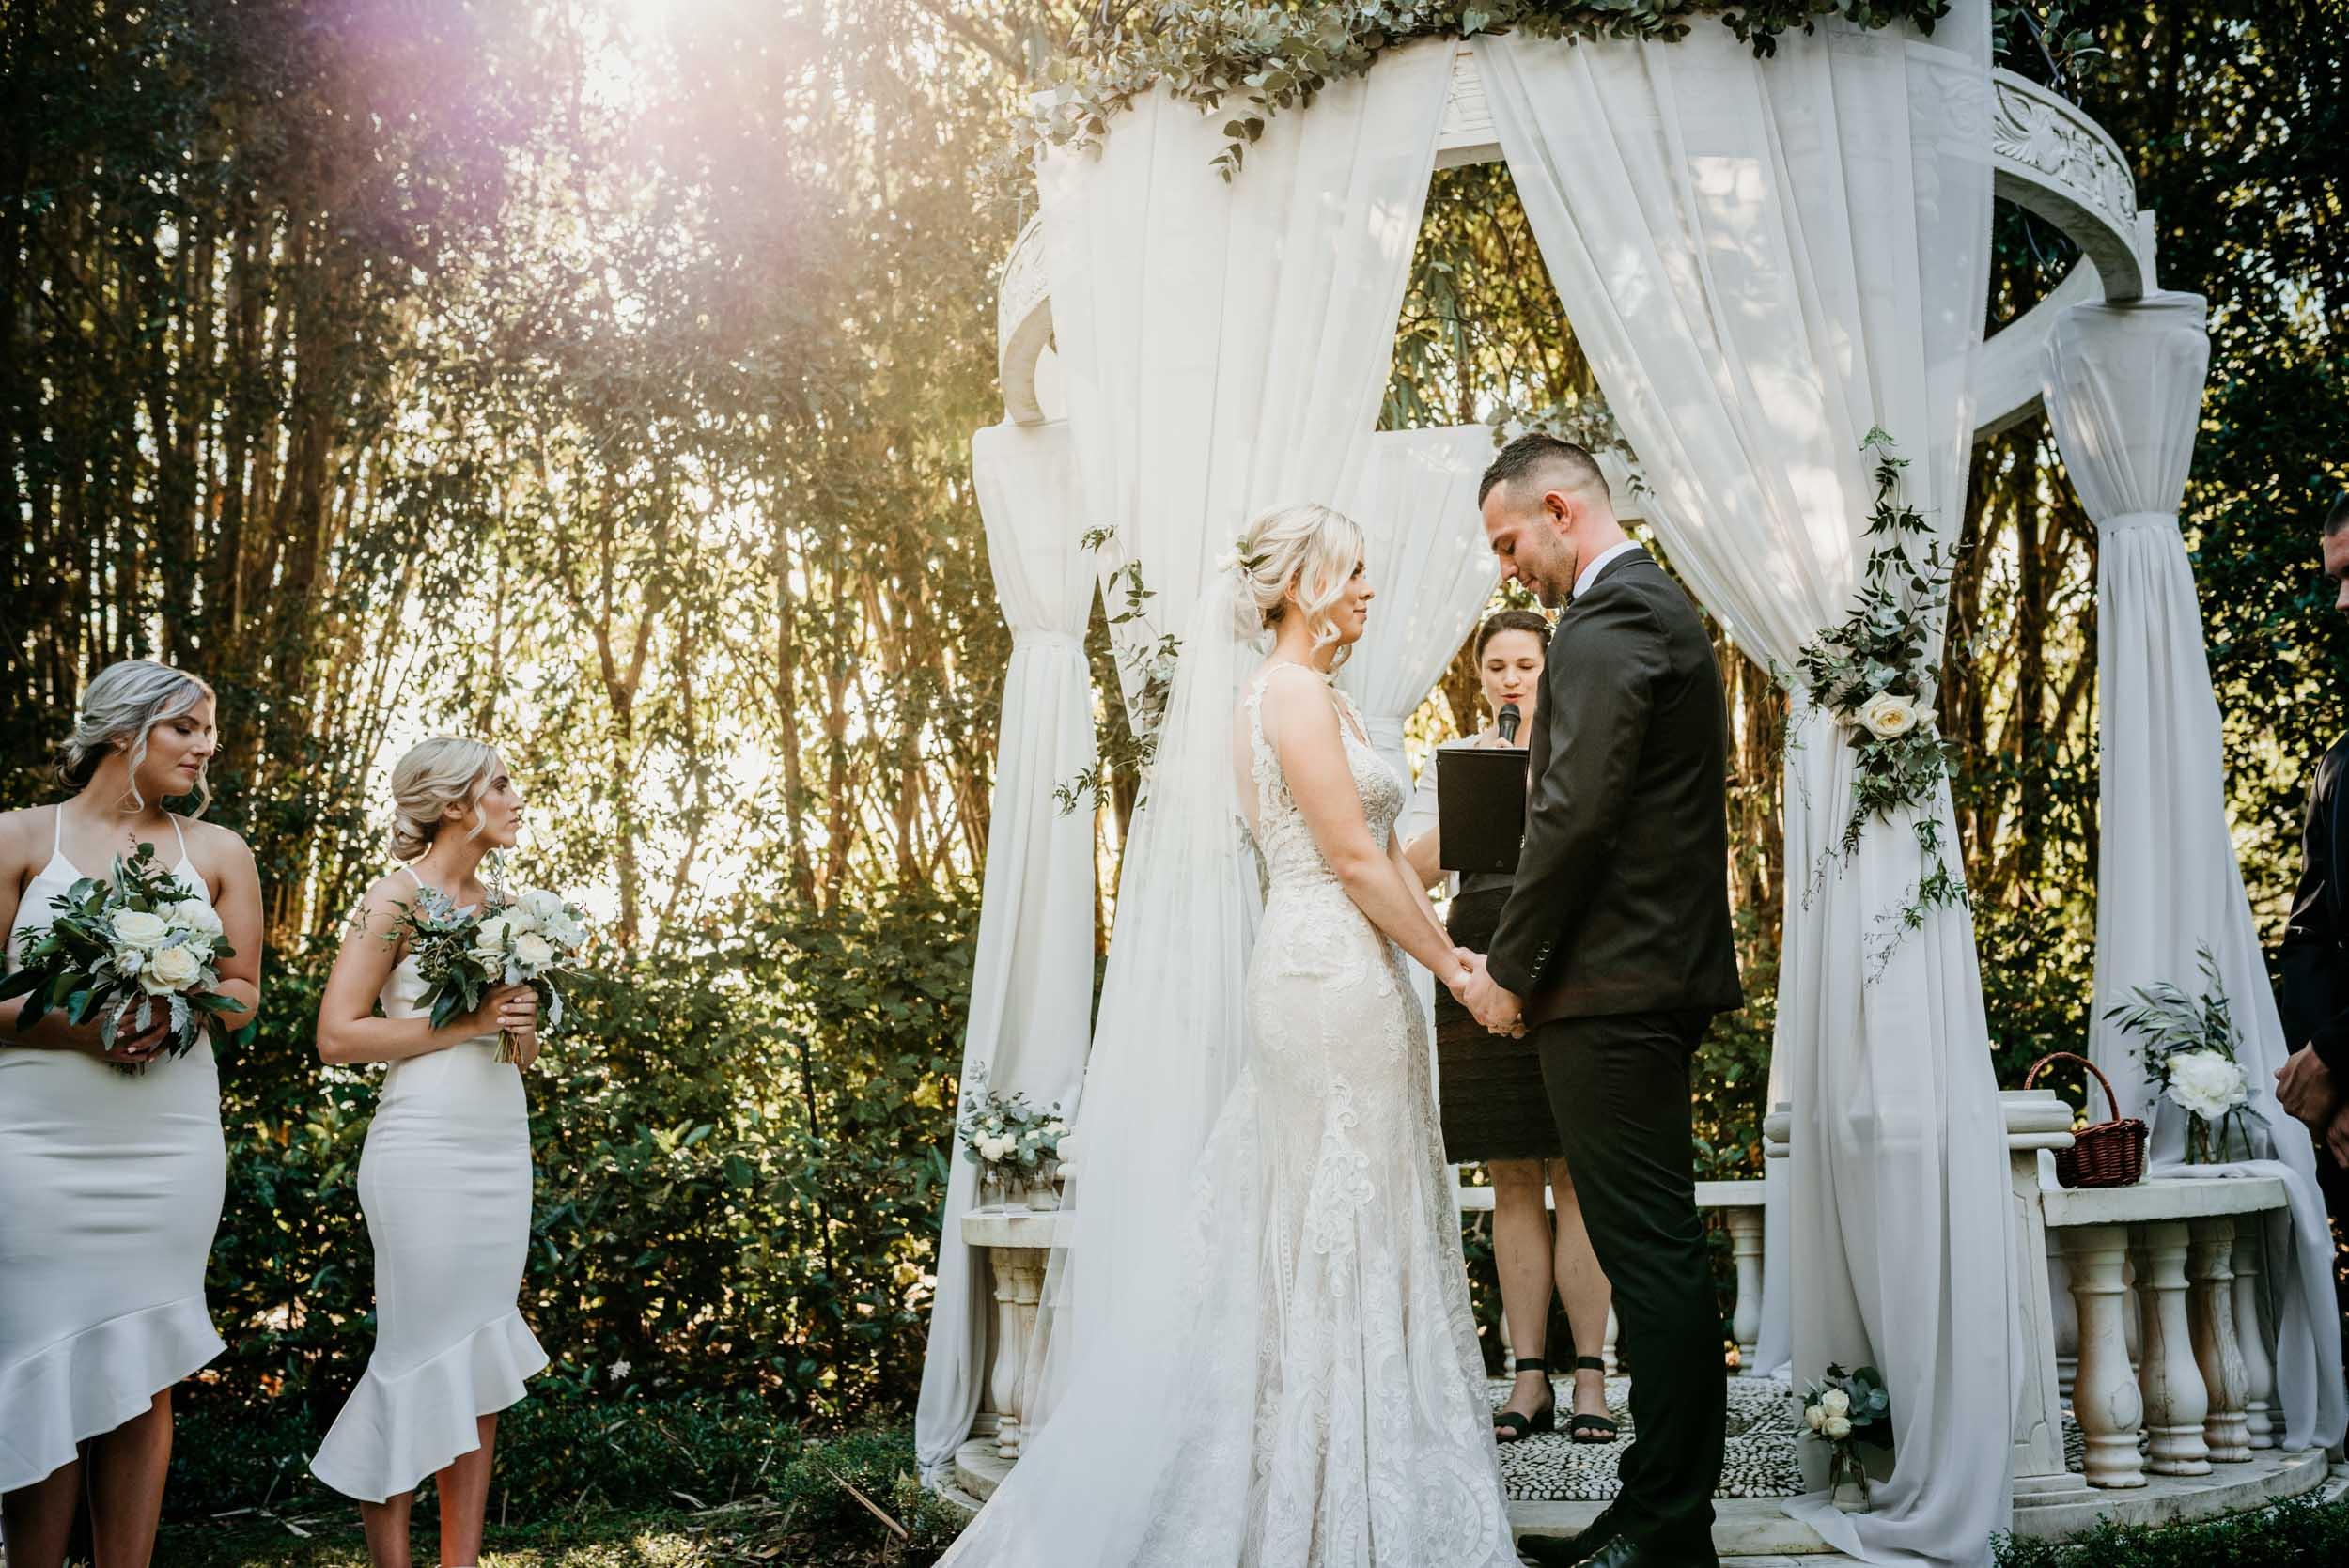 The Raw Photographer - Cairns Wedding Photographer - Laloli - Cairns Garden Wedding - Bride Dress - Destination Wed - Outdoor Reception - Queensland Ceremony-31.jpg